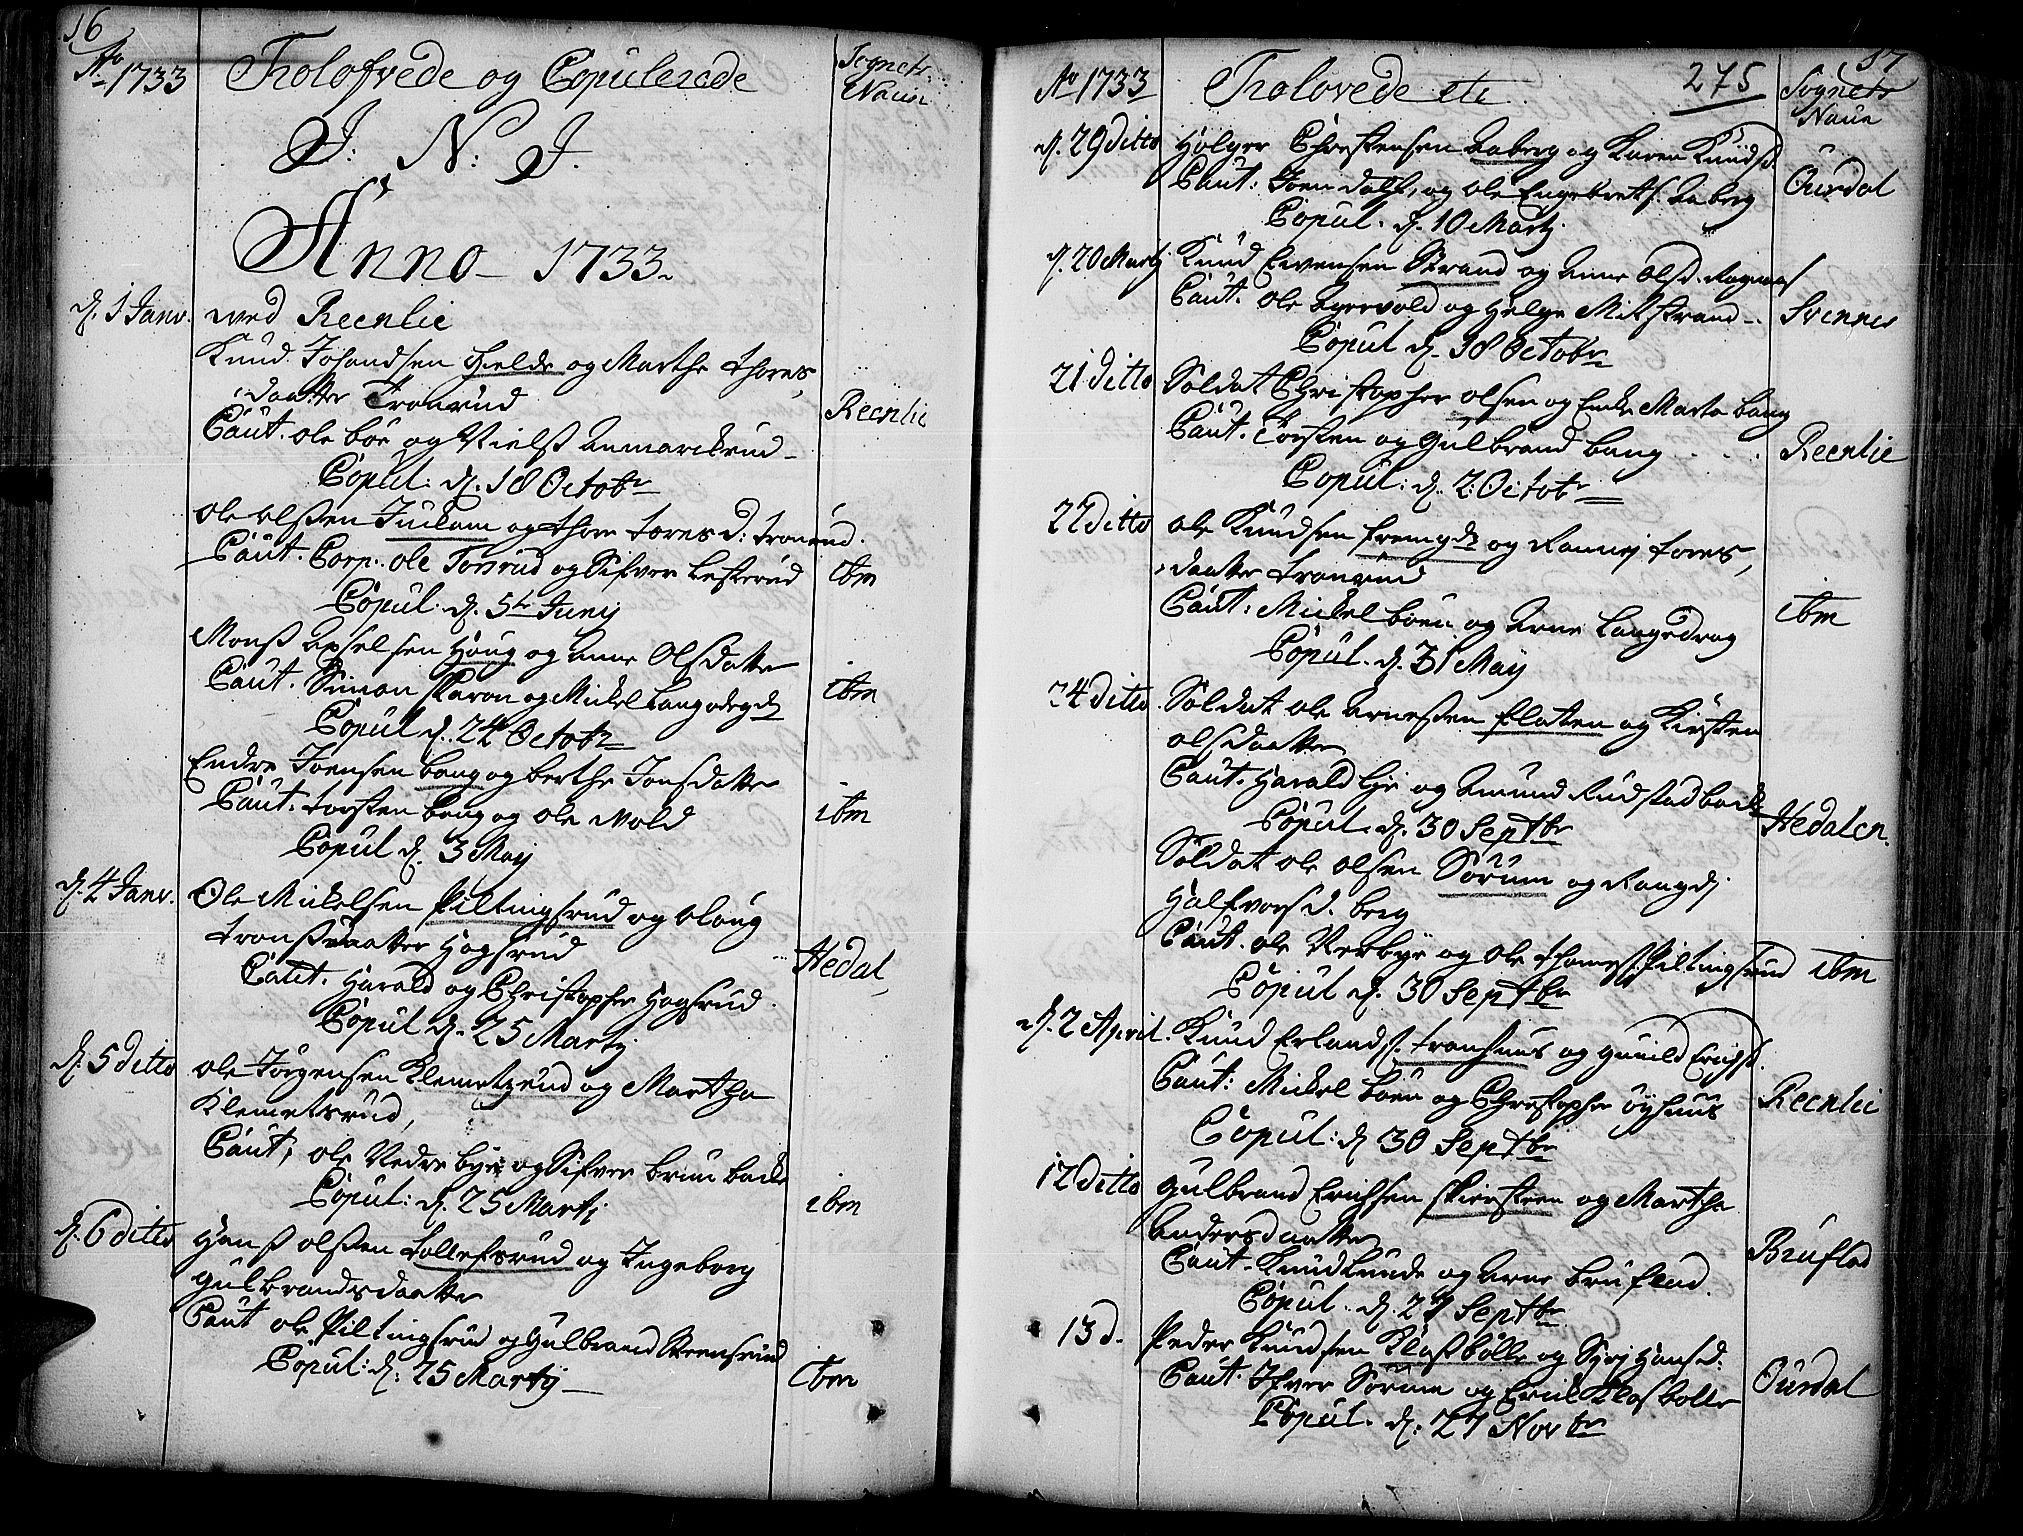 SAH, Aurdal prestekontor, Ministerialbok nr. 4, 1730-1762, s. 16-17